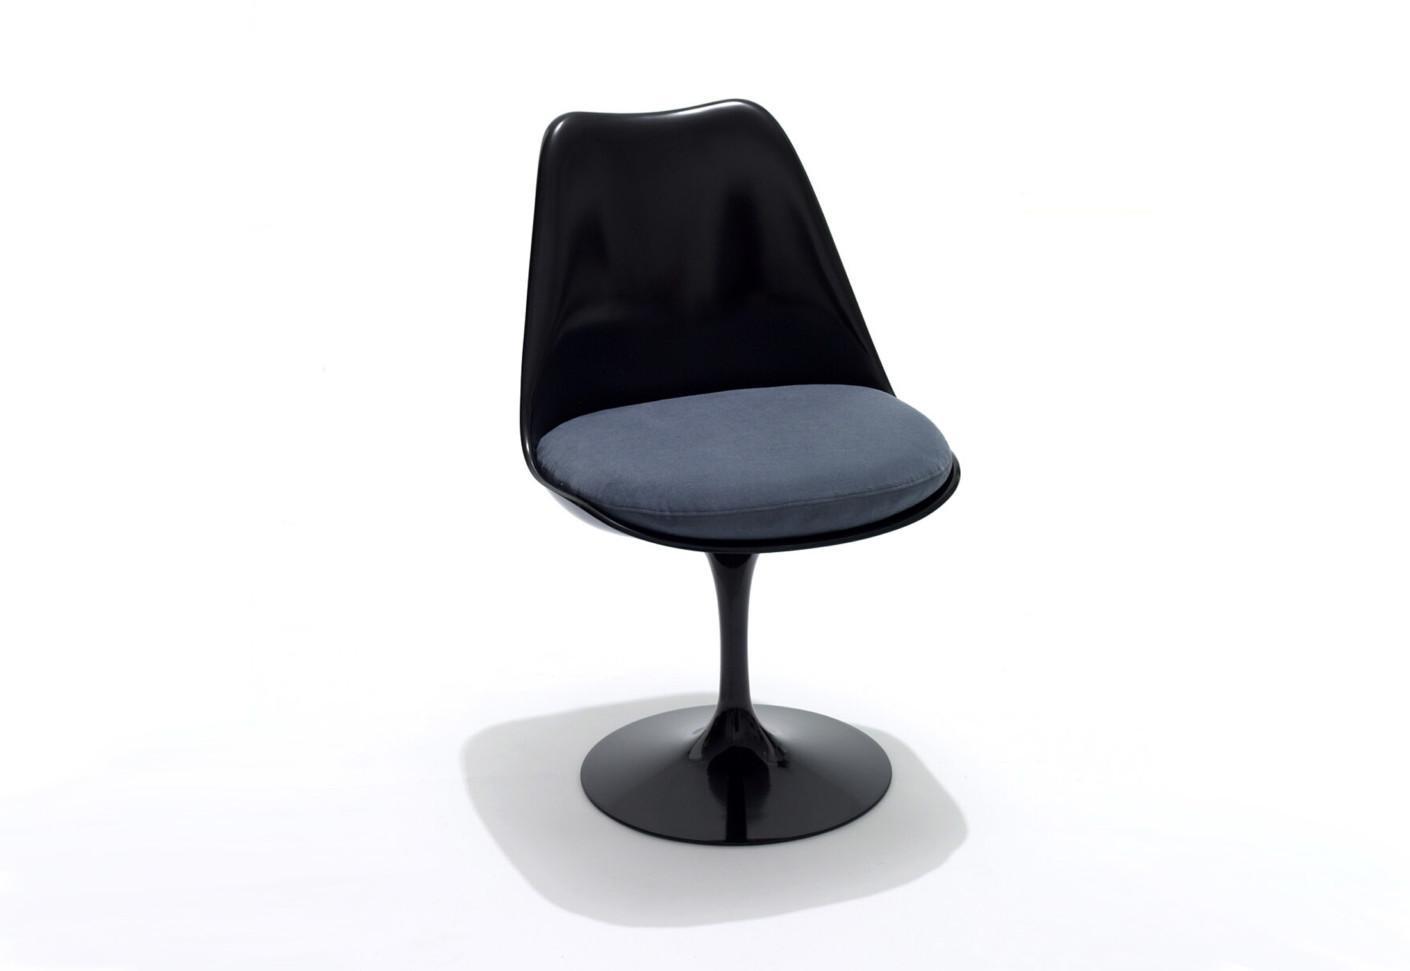 saarinen tulip chair by knoll stylepark. Black Bedroom Furniture Sets. Home Design Ideas